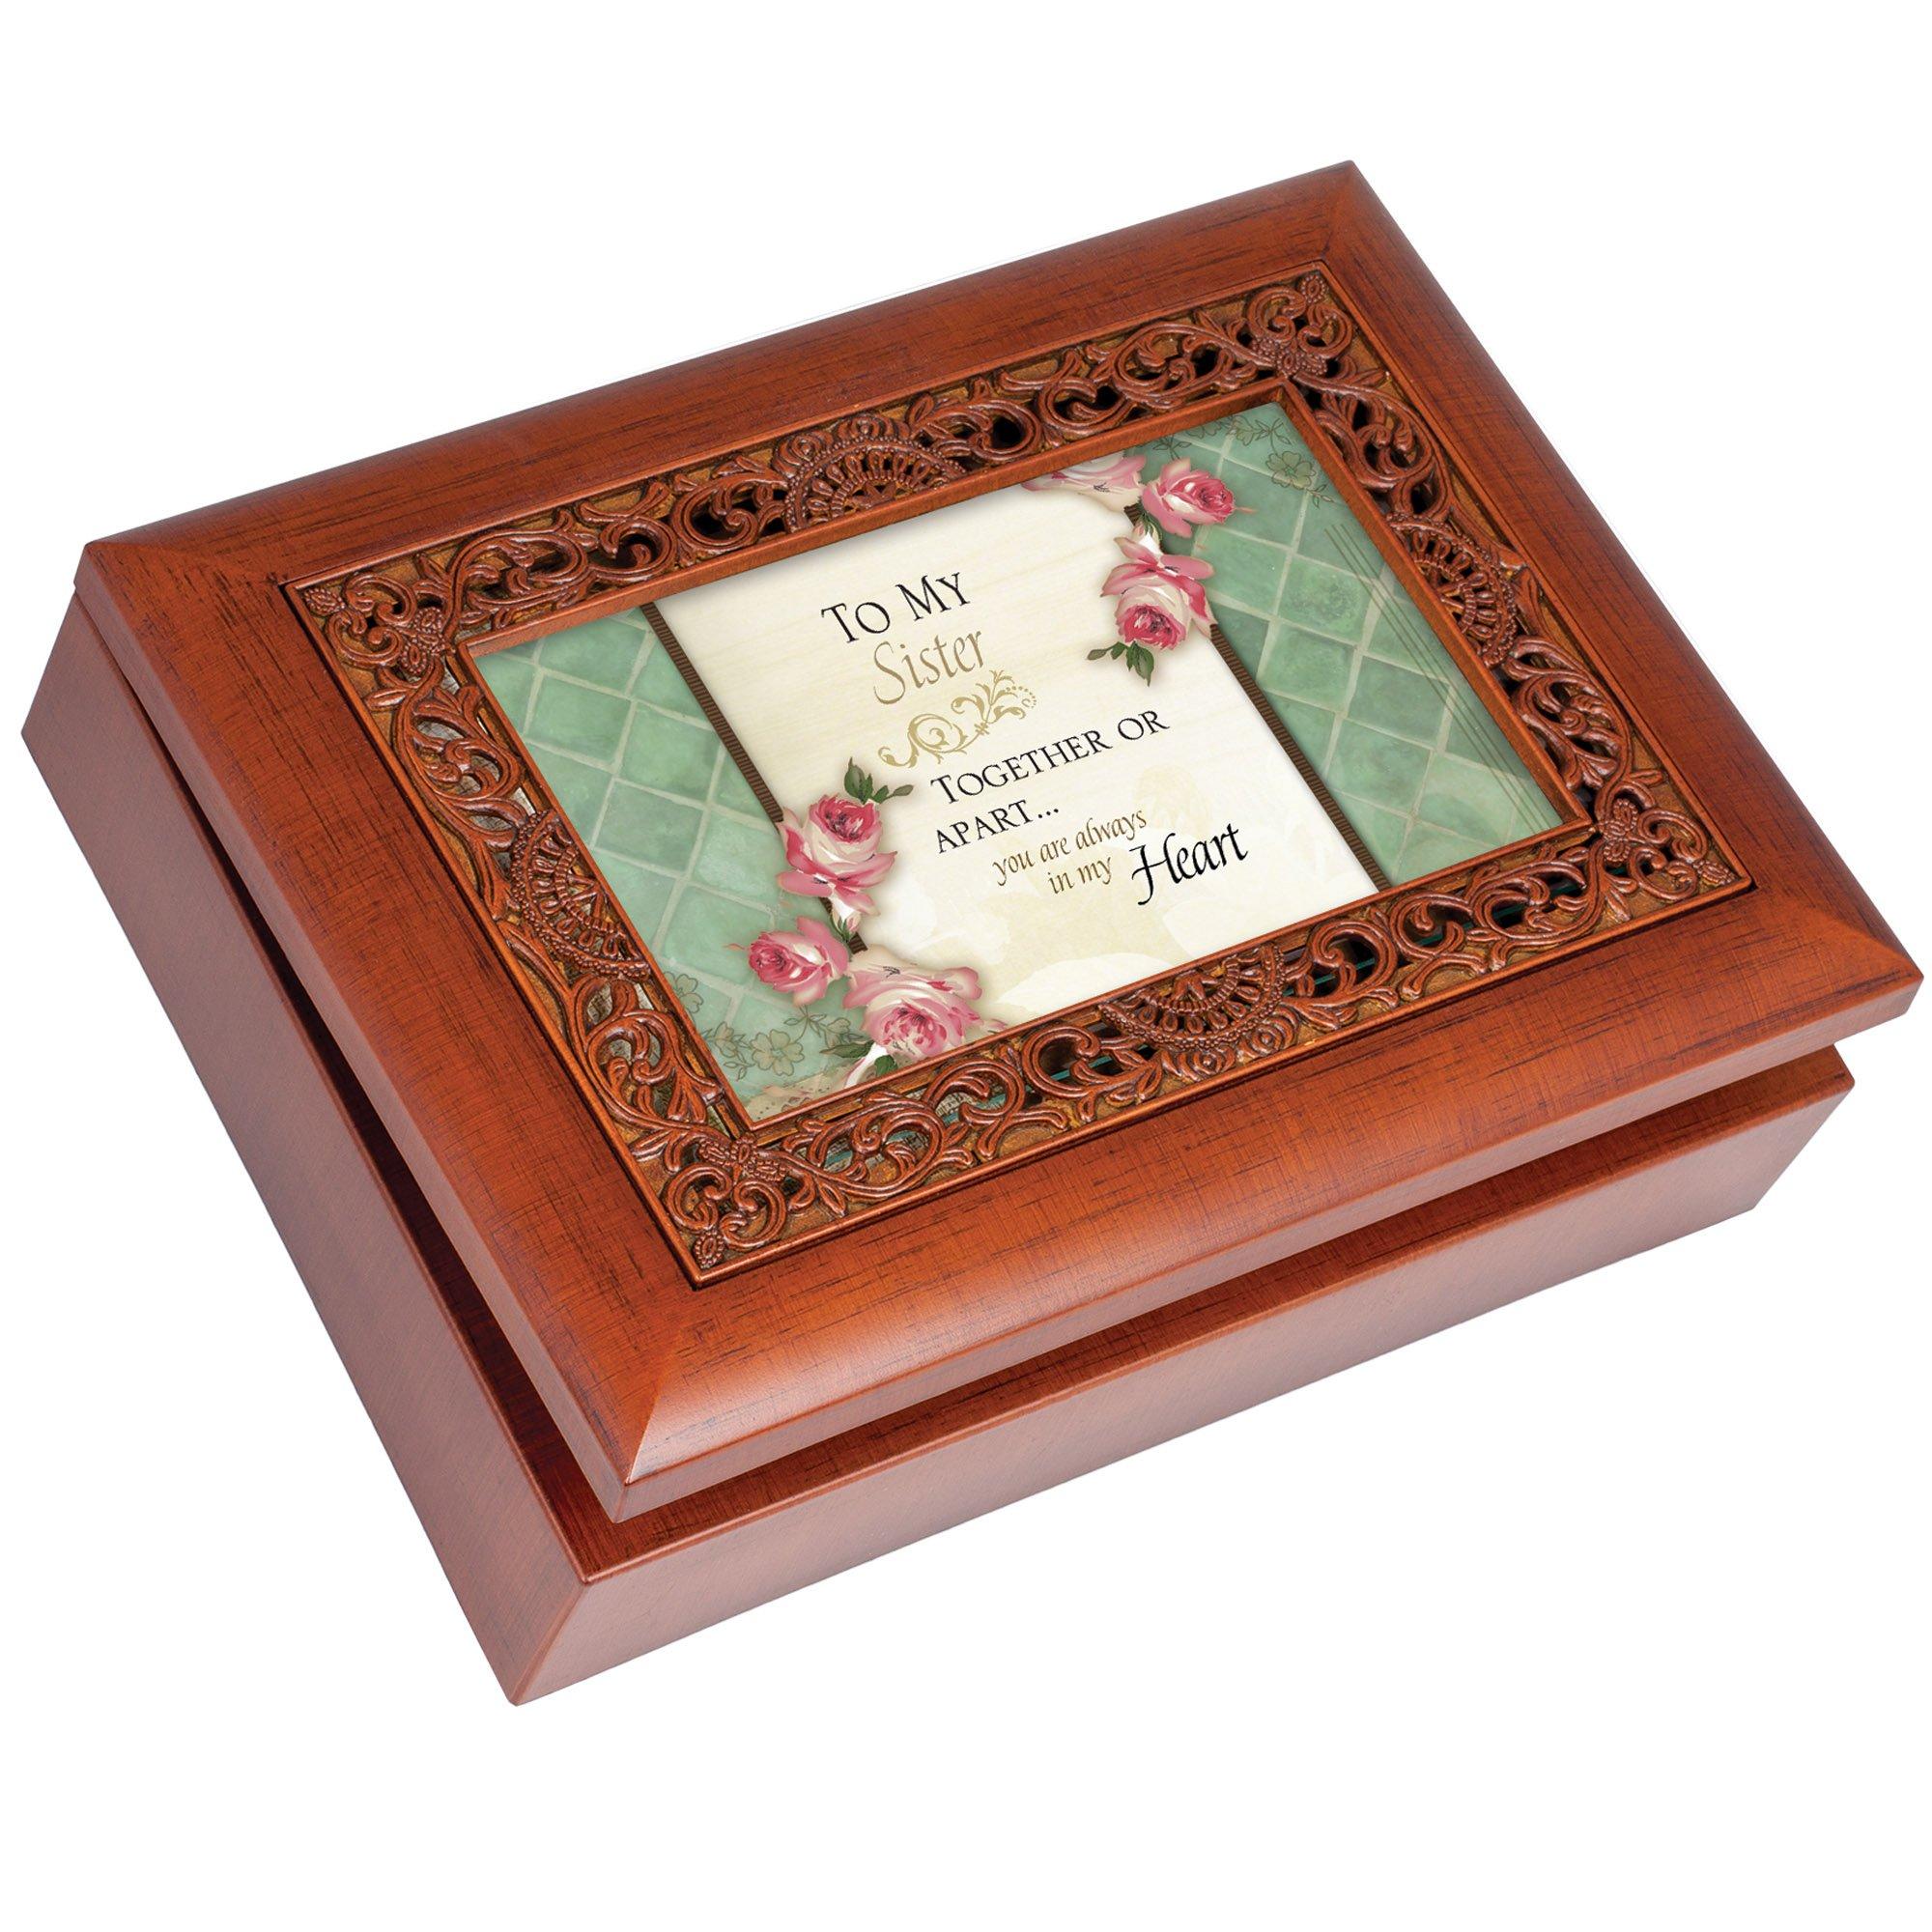 Cottage Garden Sister Woodgrain Ornate Music Box Plays Wonderful World by Cottage Garden (Image #1)